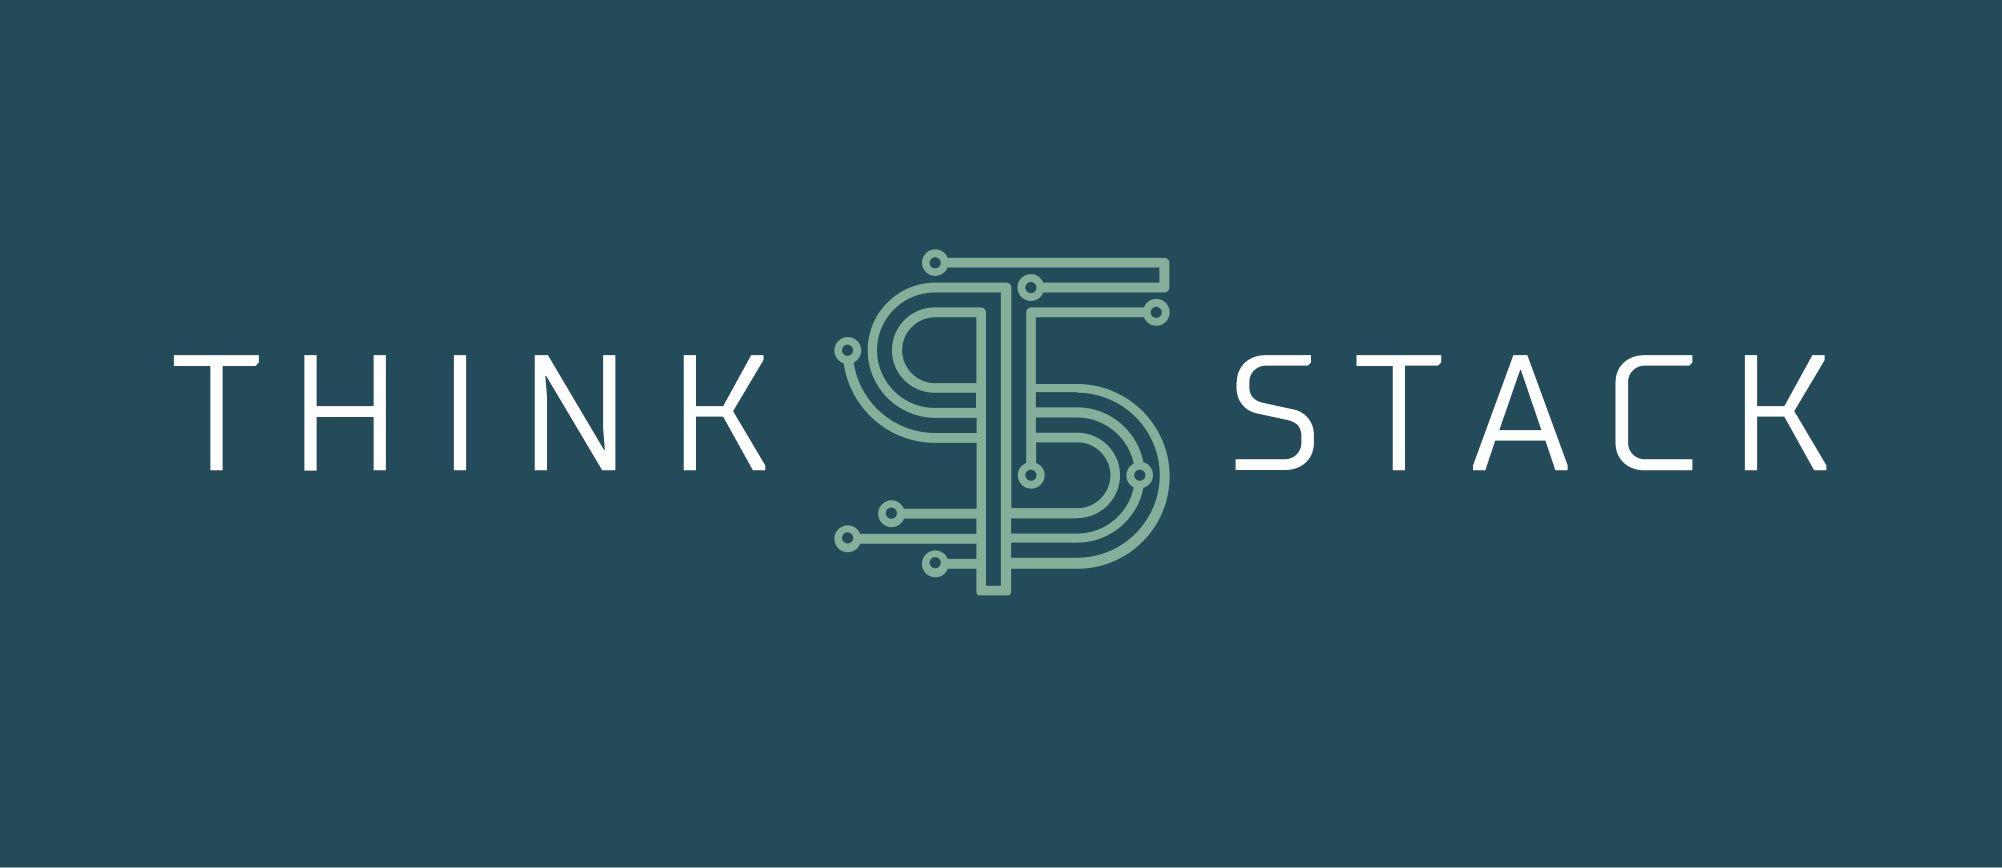 Think Stack logo over blue background